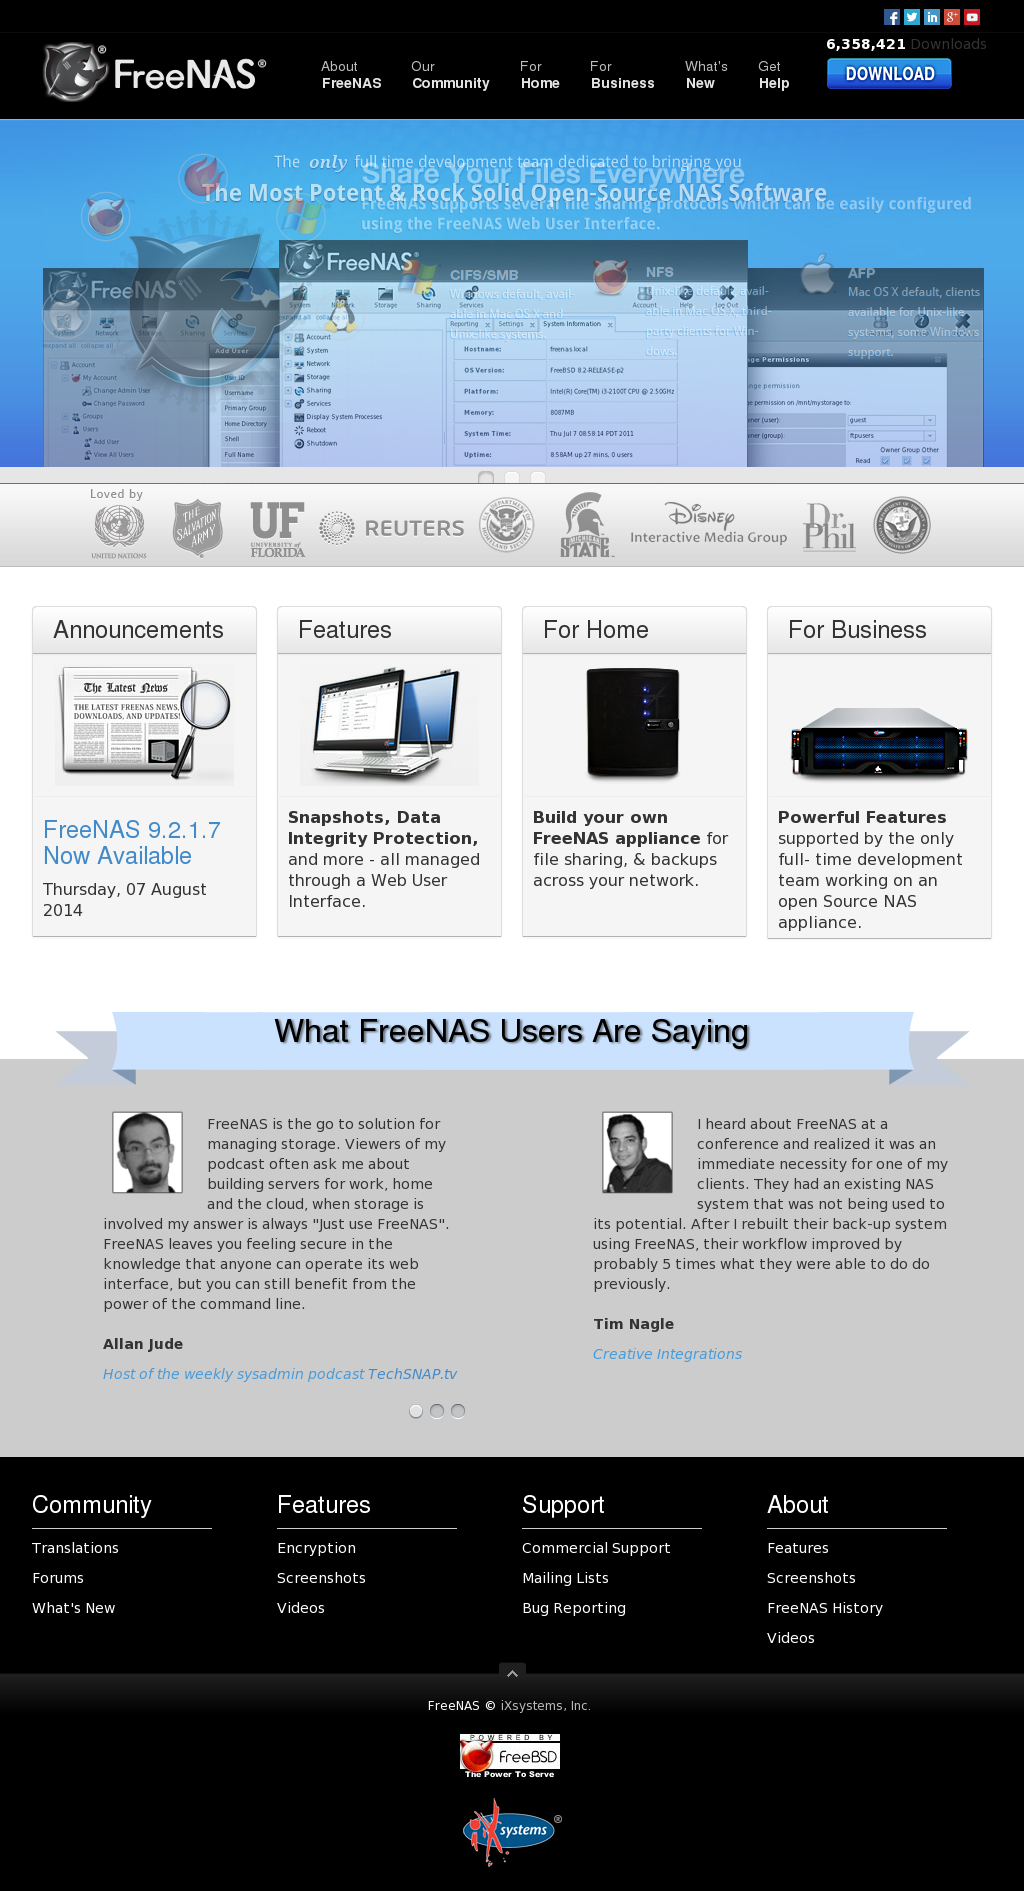 FreeNAS Competitors, Revenue and Employees - Owler Company Profile